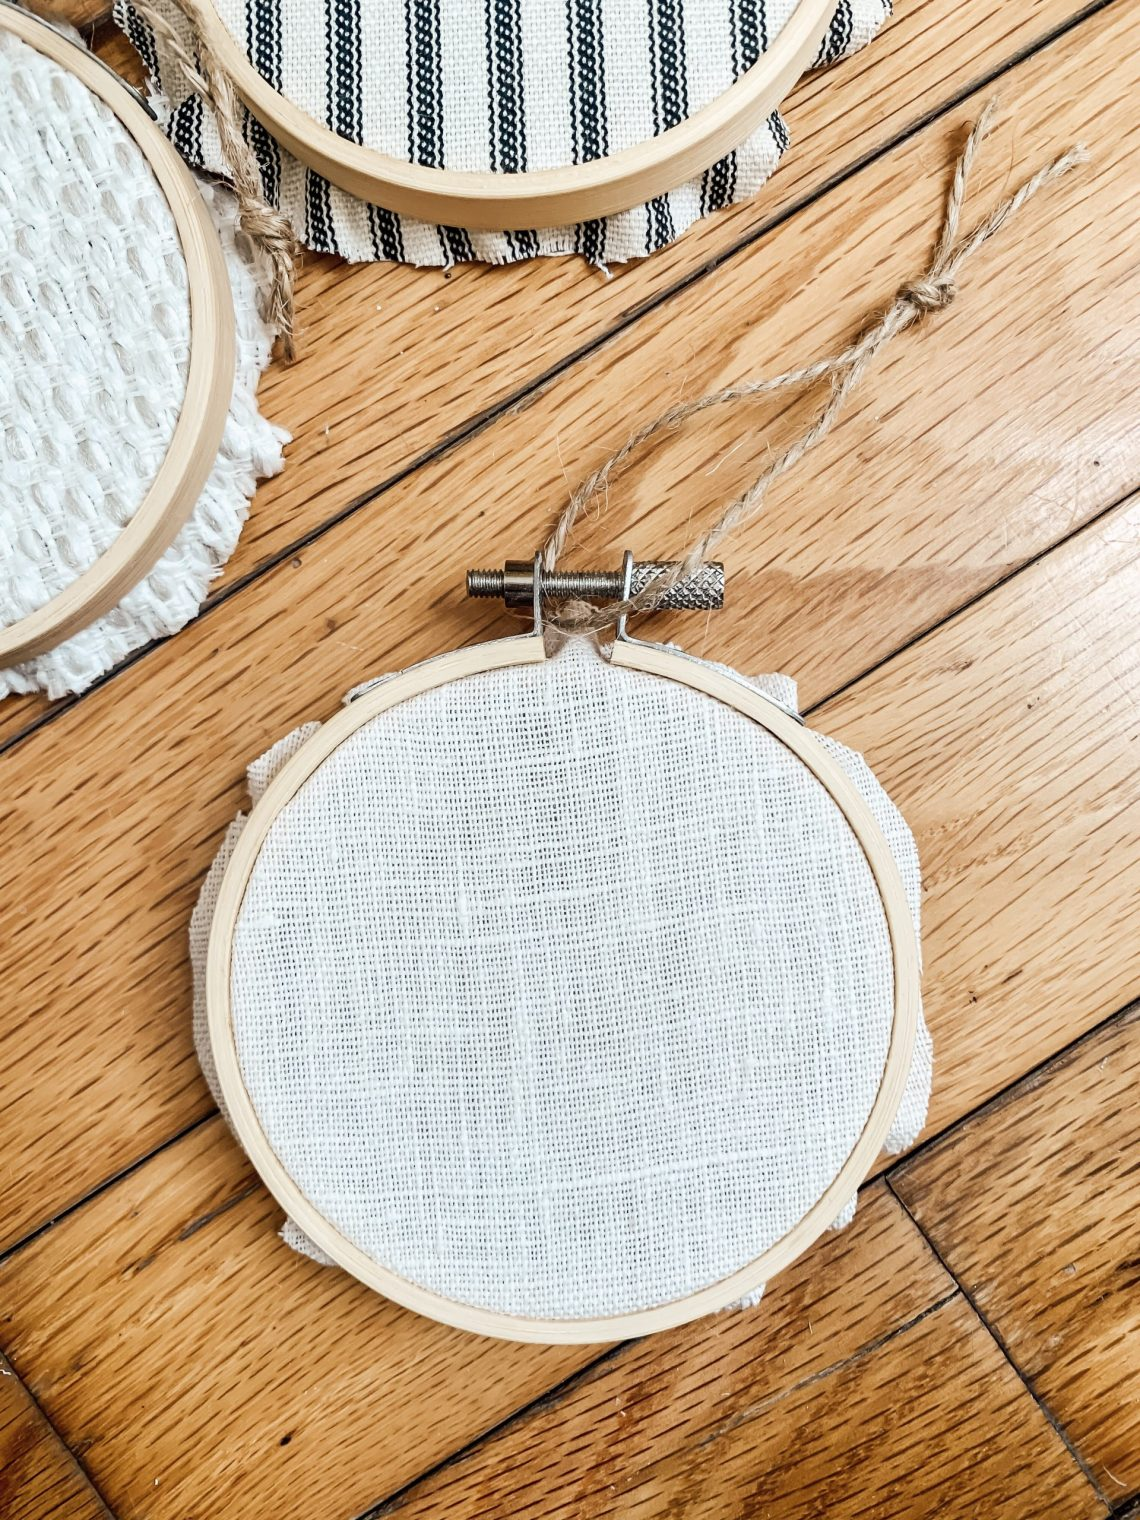 Easy Handmade Embroidery Hoop Ornaments